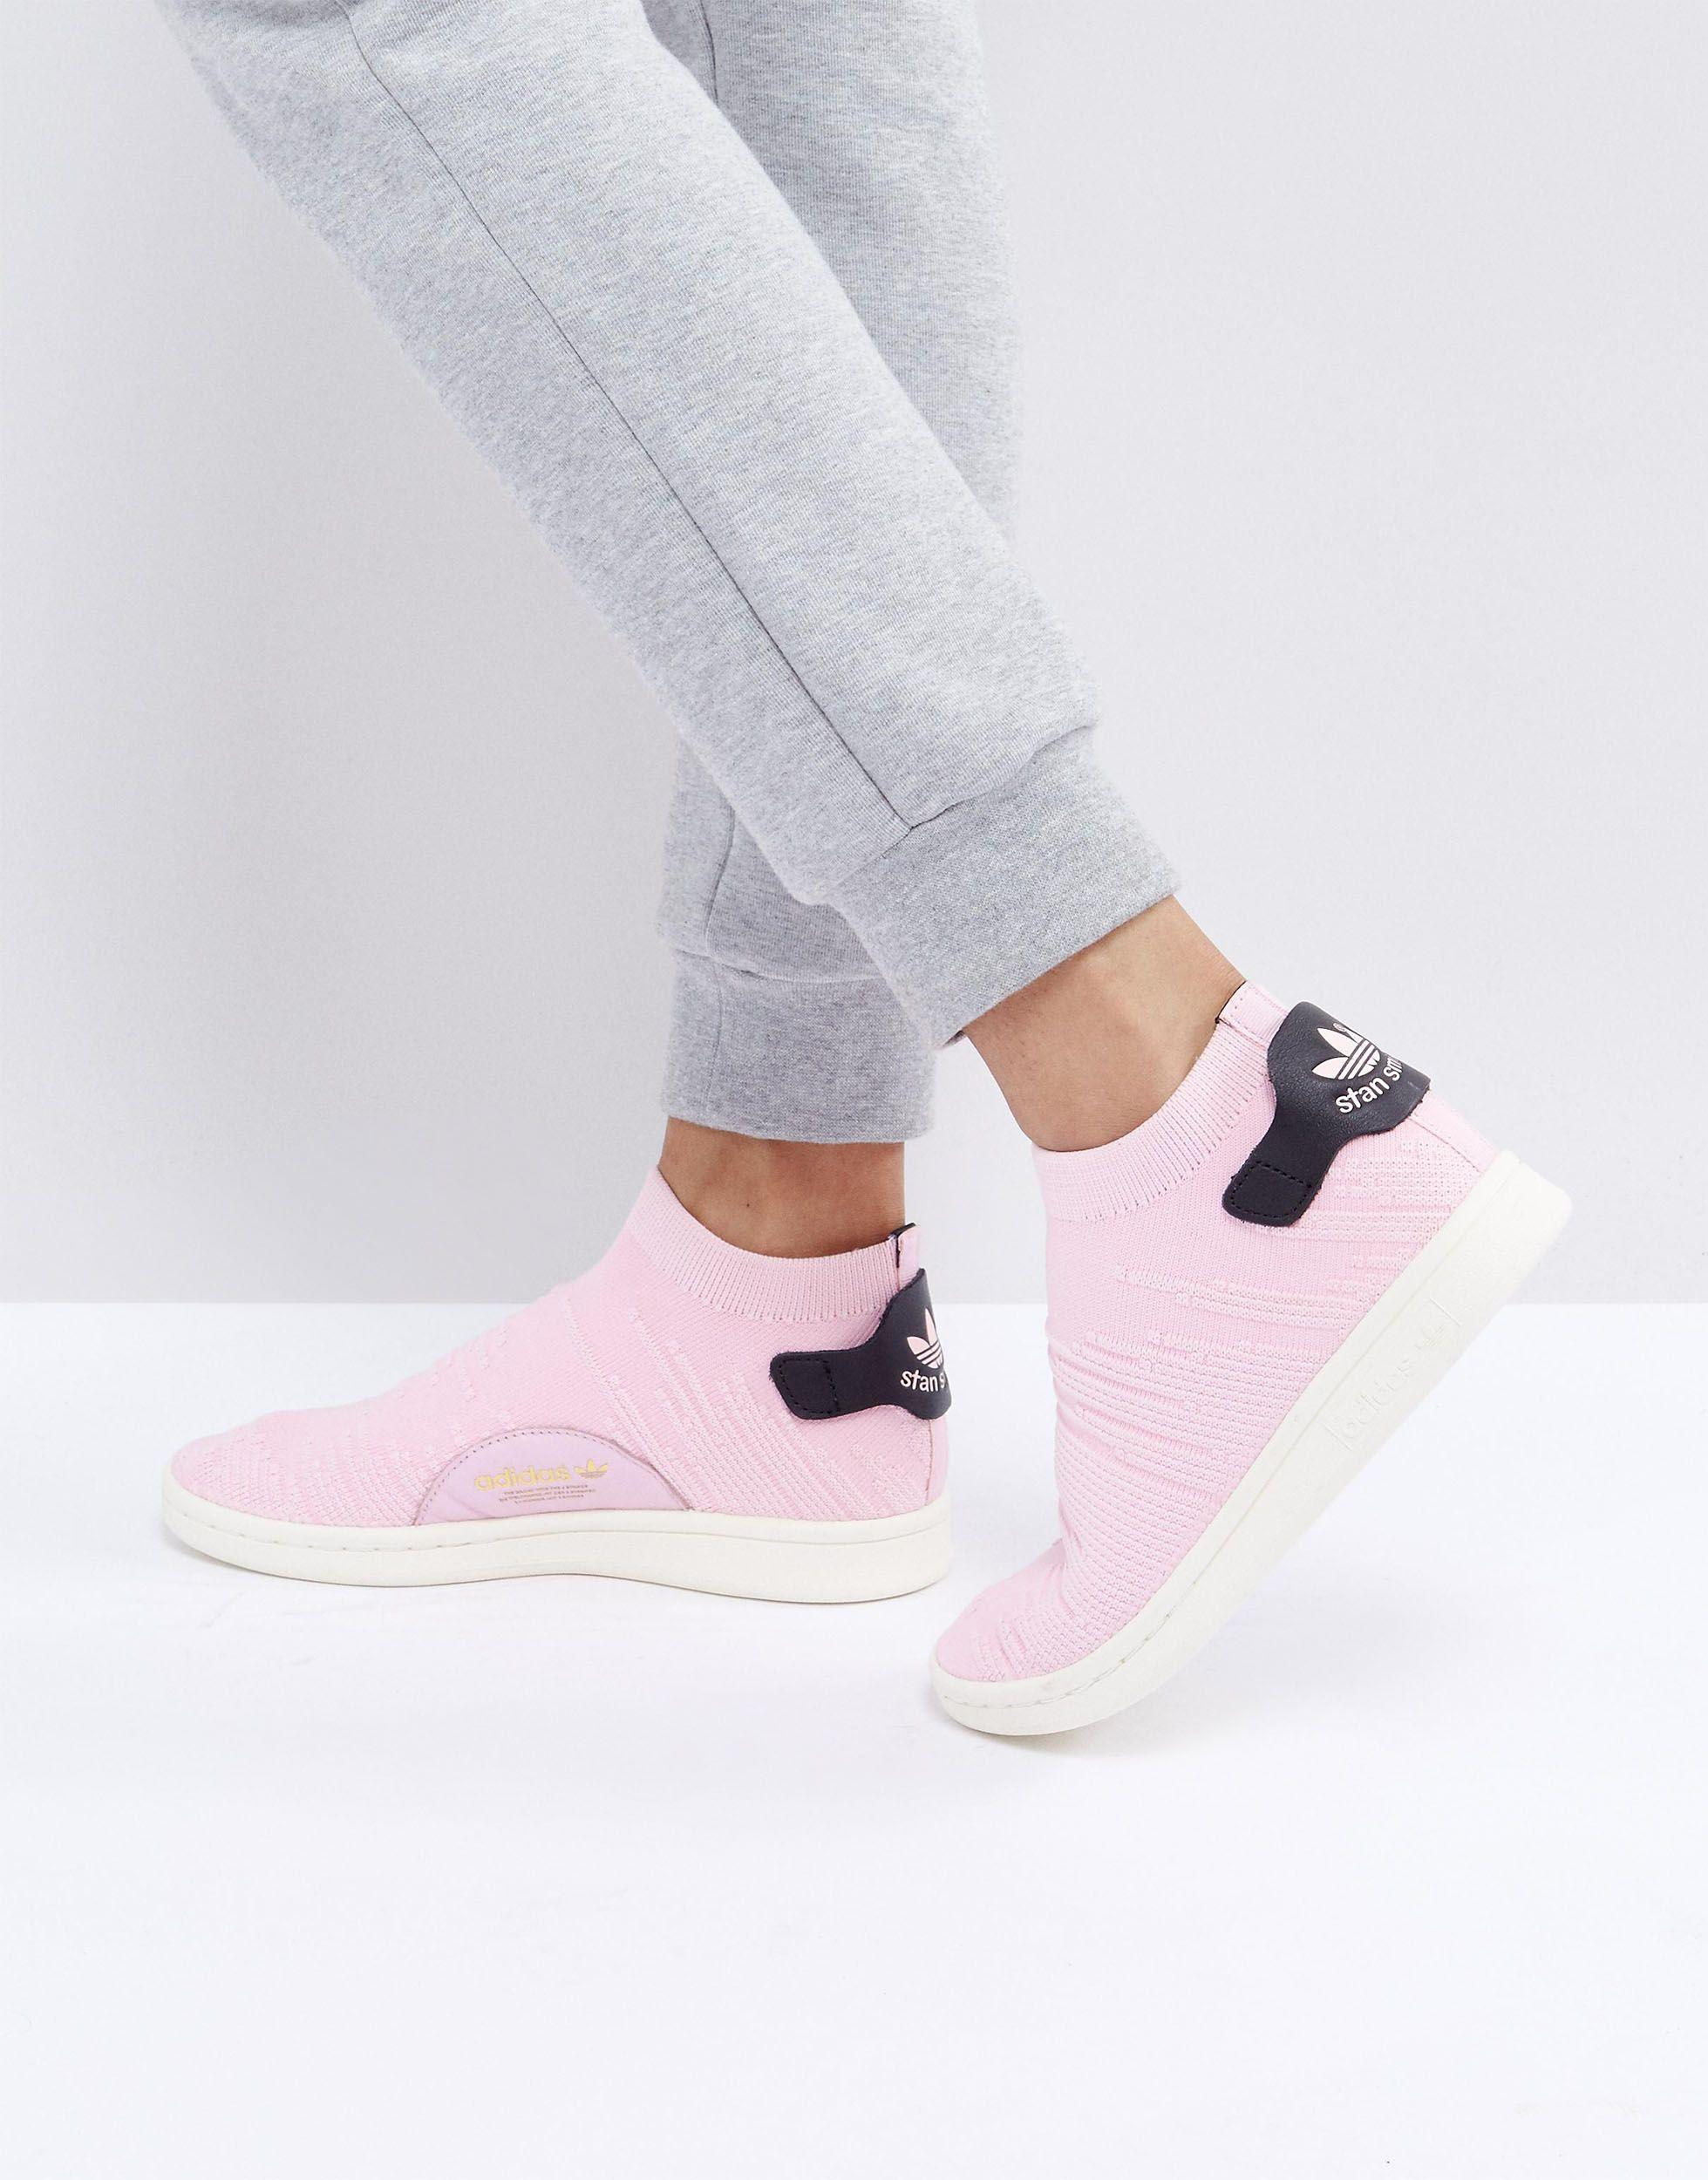 Stan Smith Primeknit - Baskets chaussettes Cuir adidas Originals ...